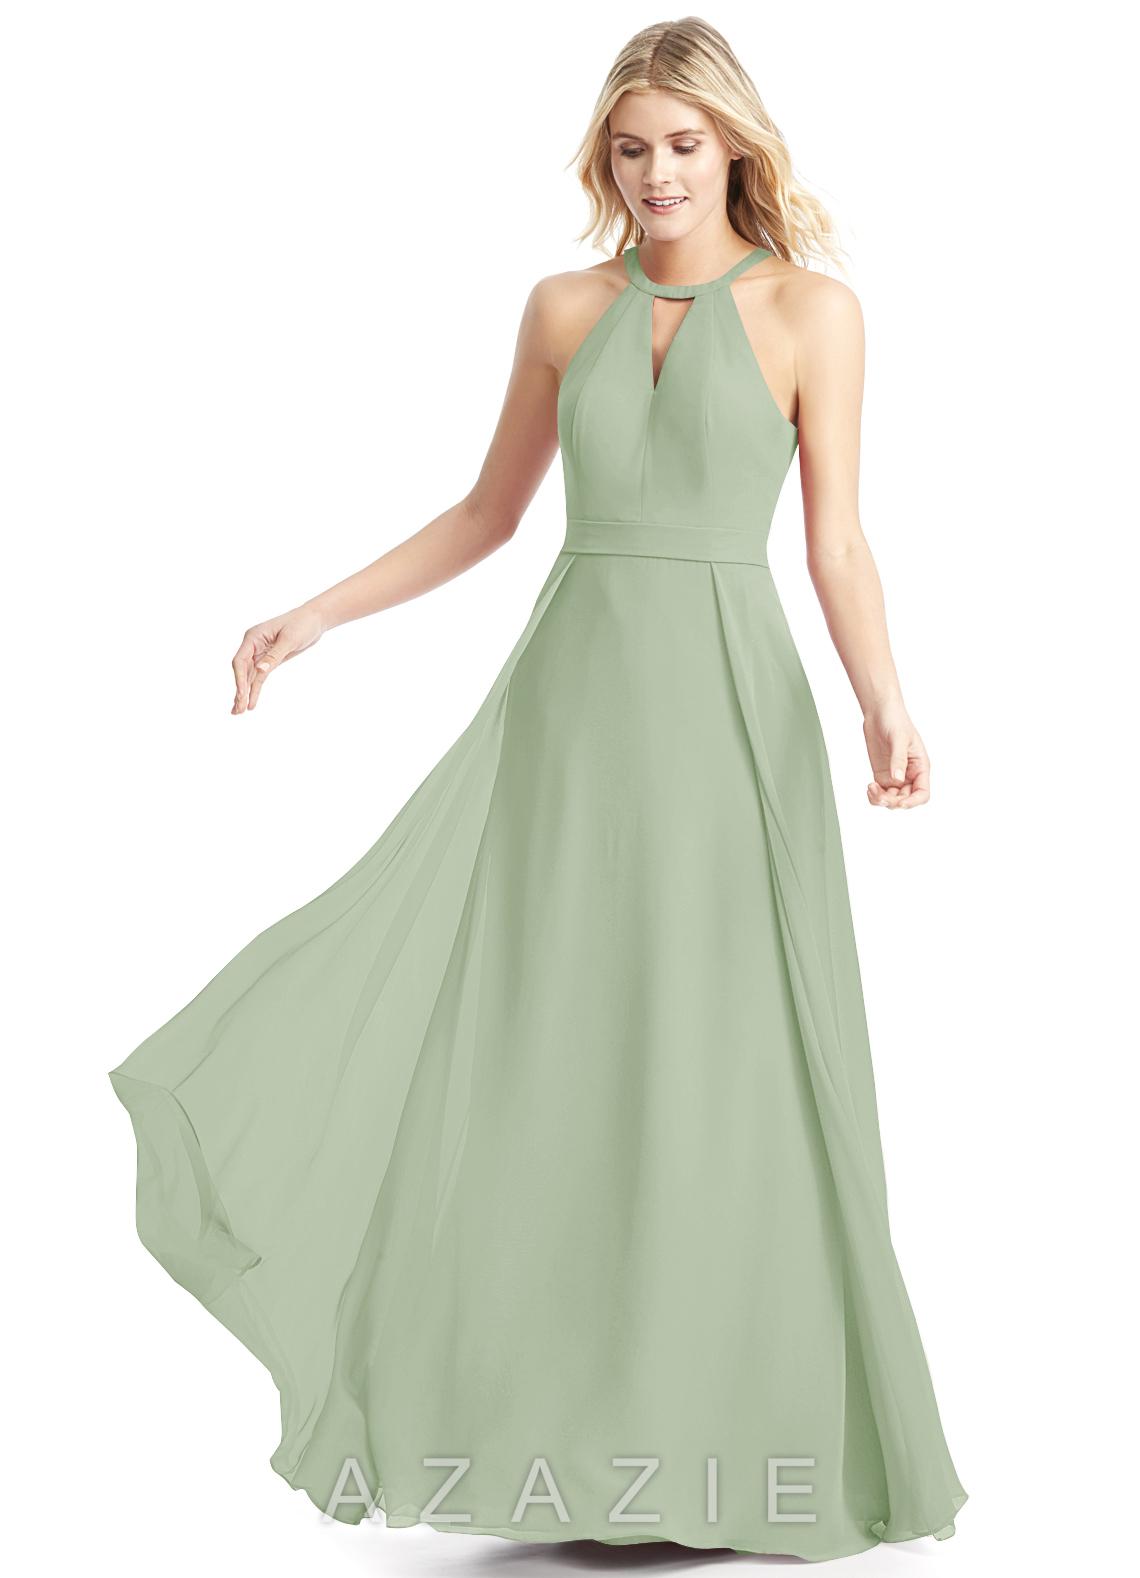 d15836cd60f Azazie Melody Bridesmaid Dress - Dusty Sage